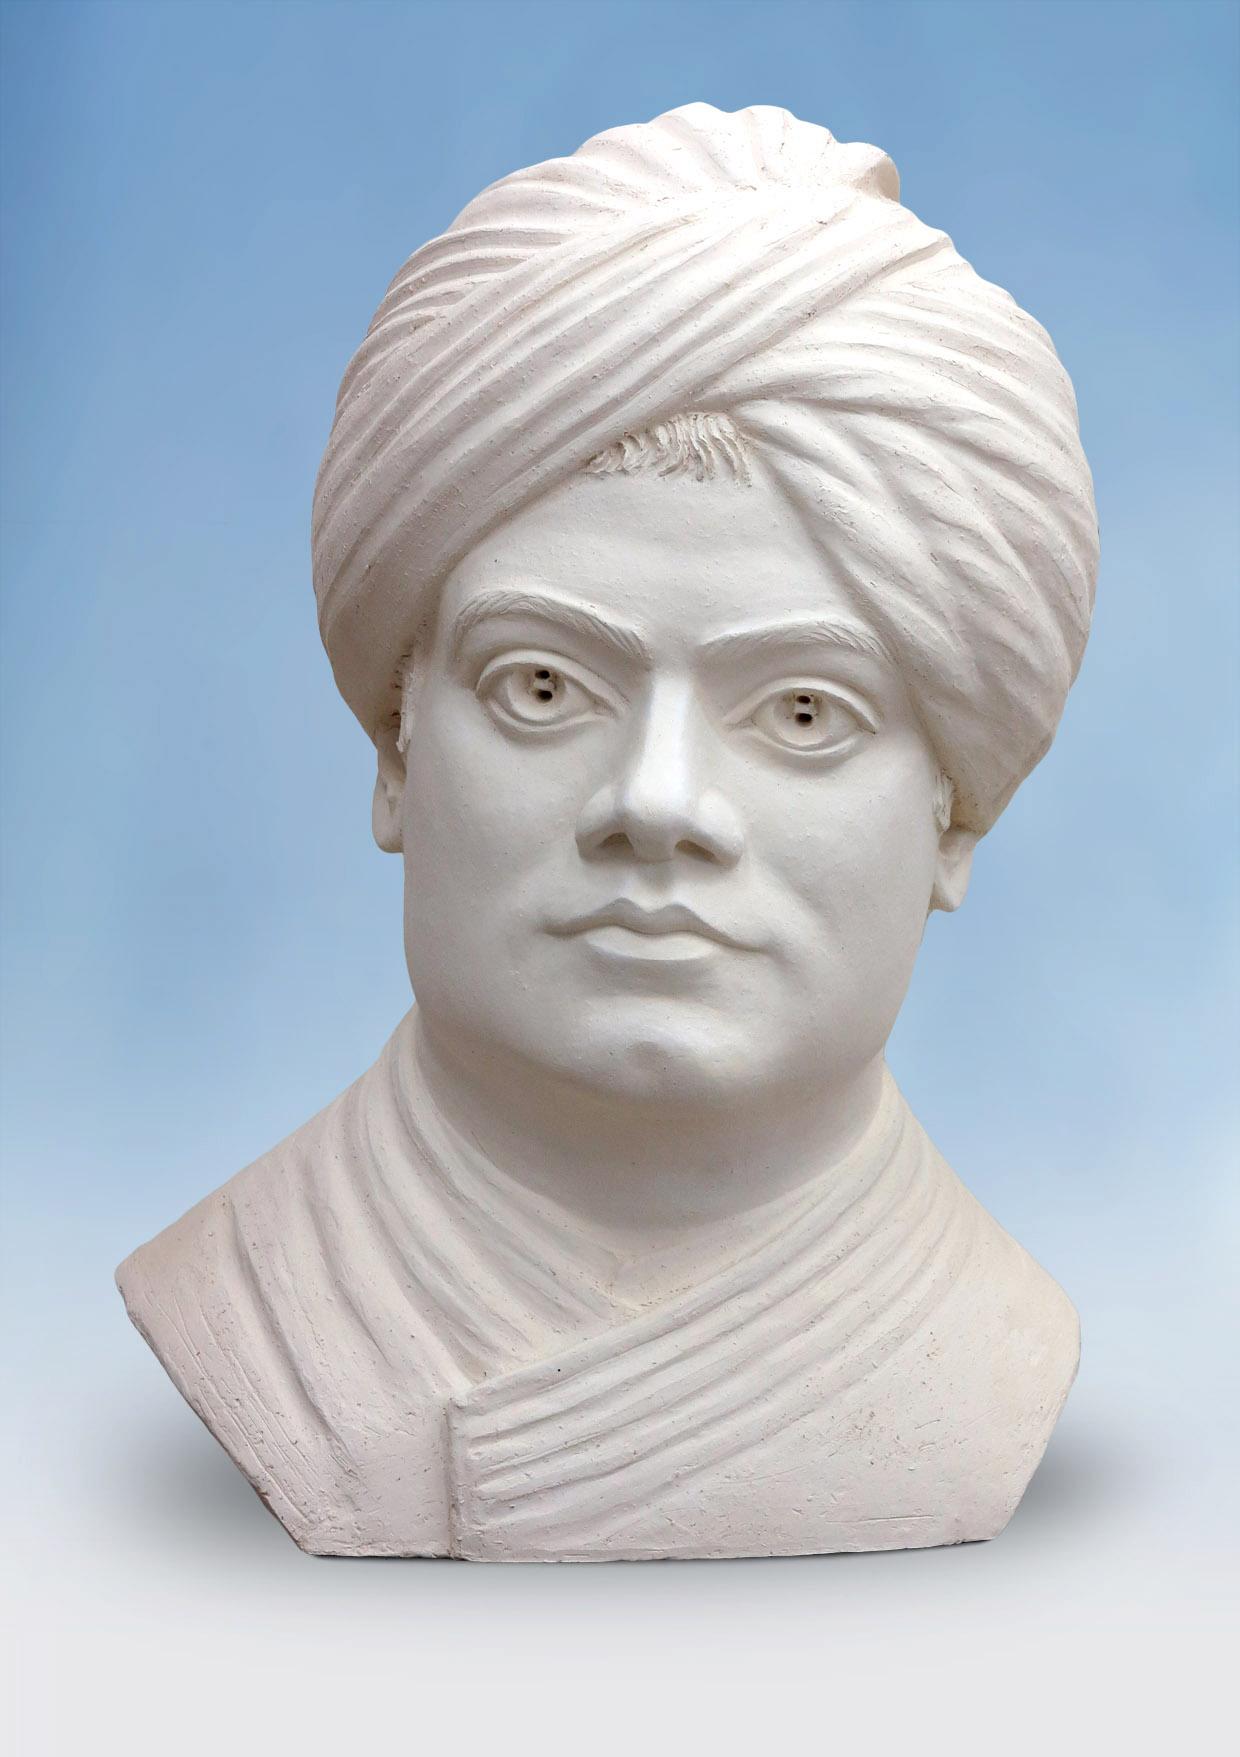 Swami Vivekananda. Great Teachers of Humanity eхhibition.  ETNOMIR  Cultural Education Center - svami vivekananda1